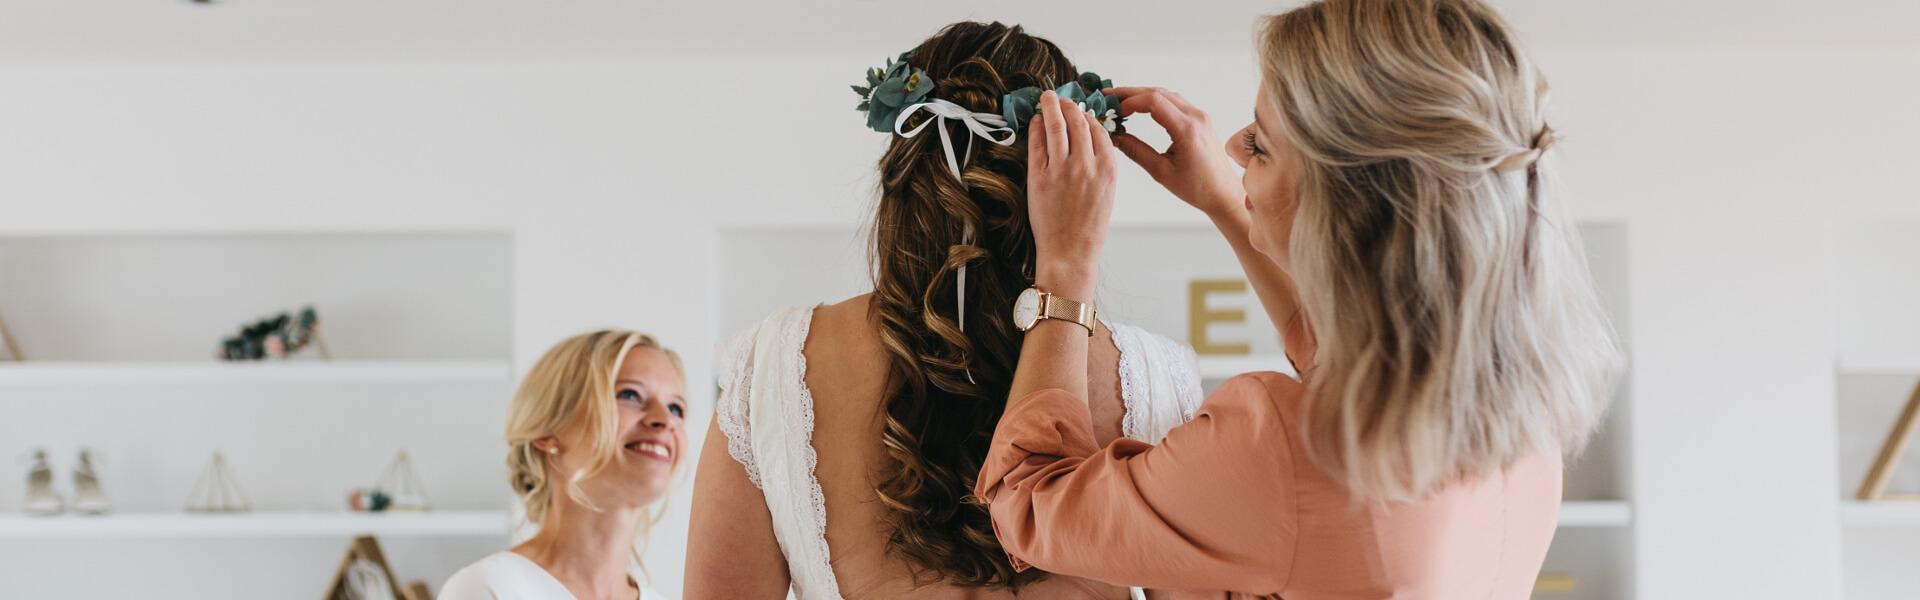 Brautmomente – Specials